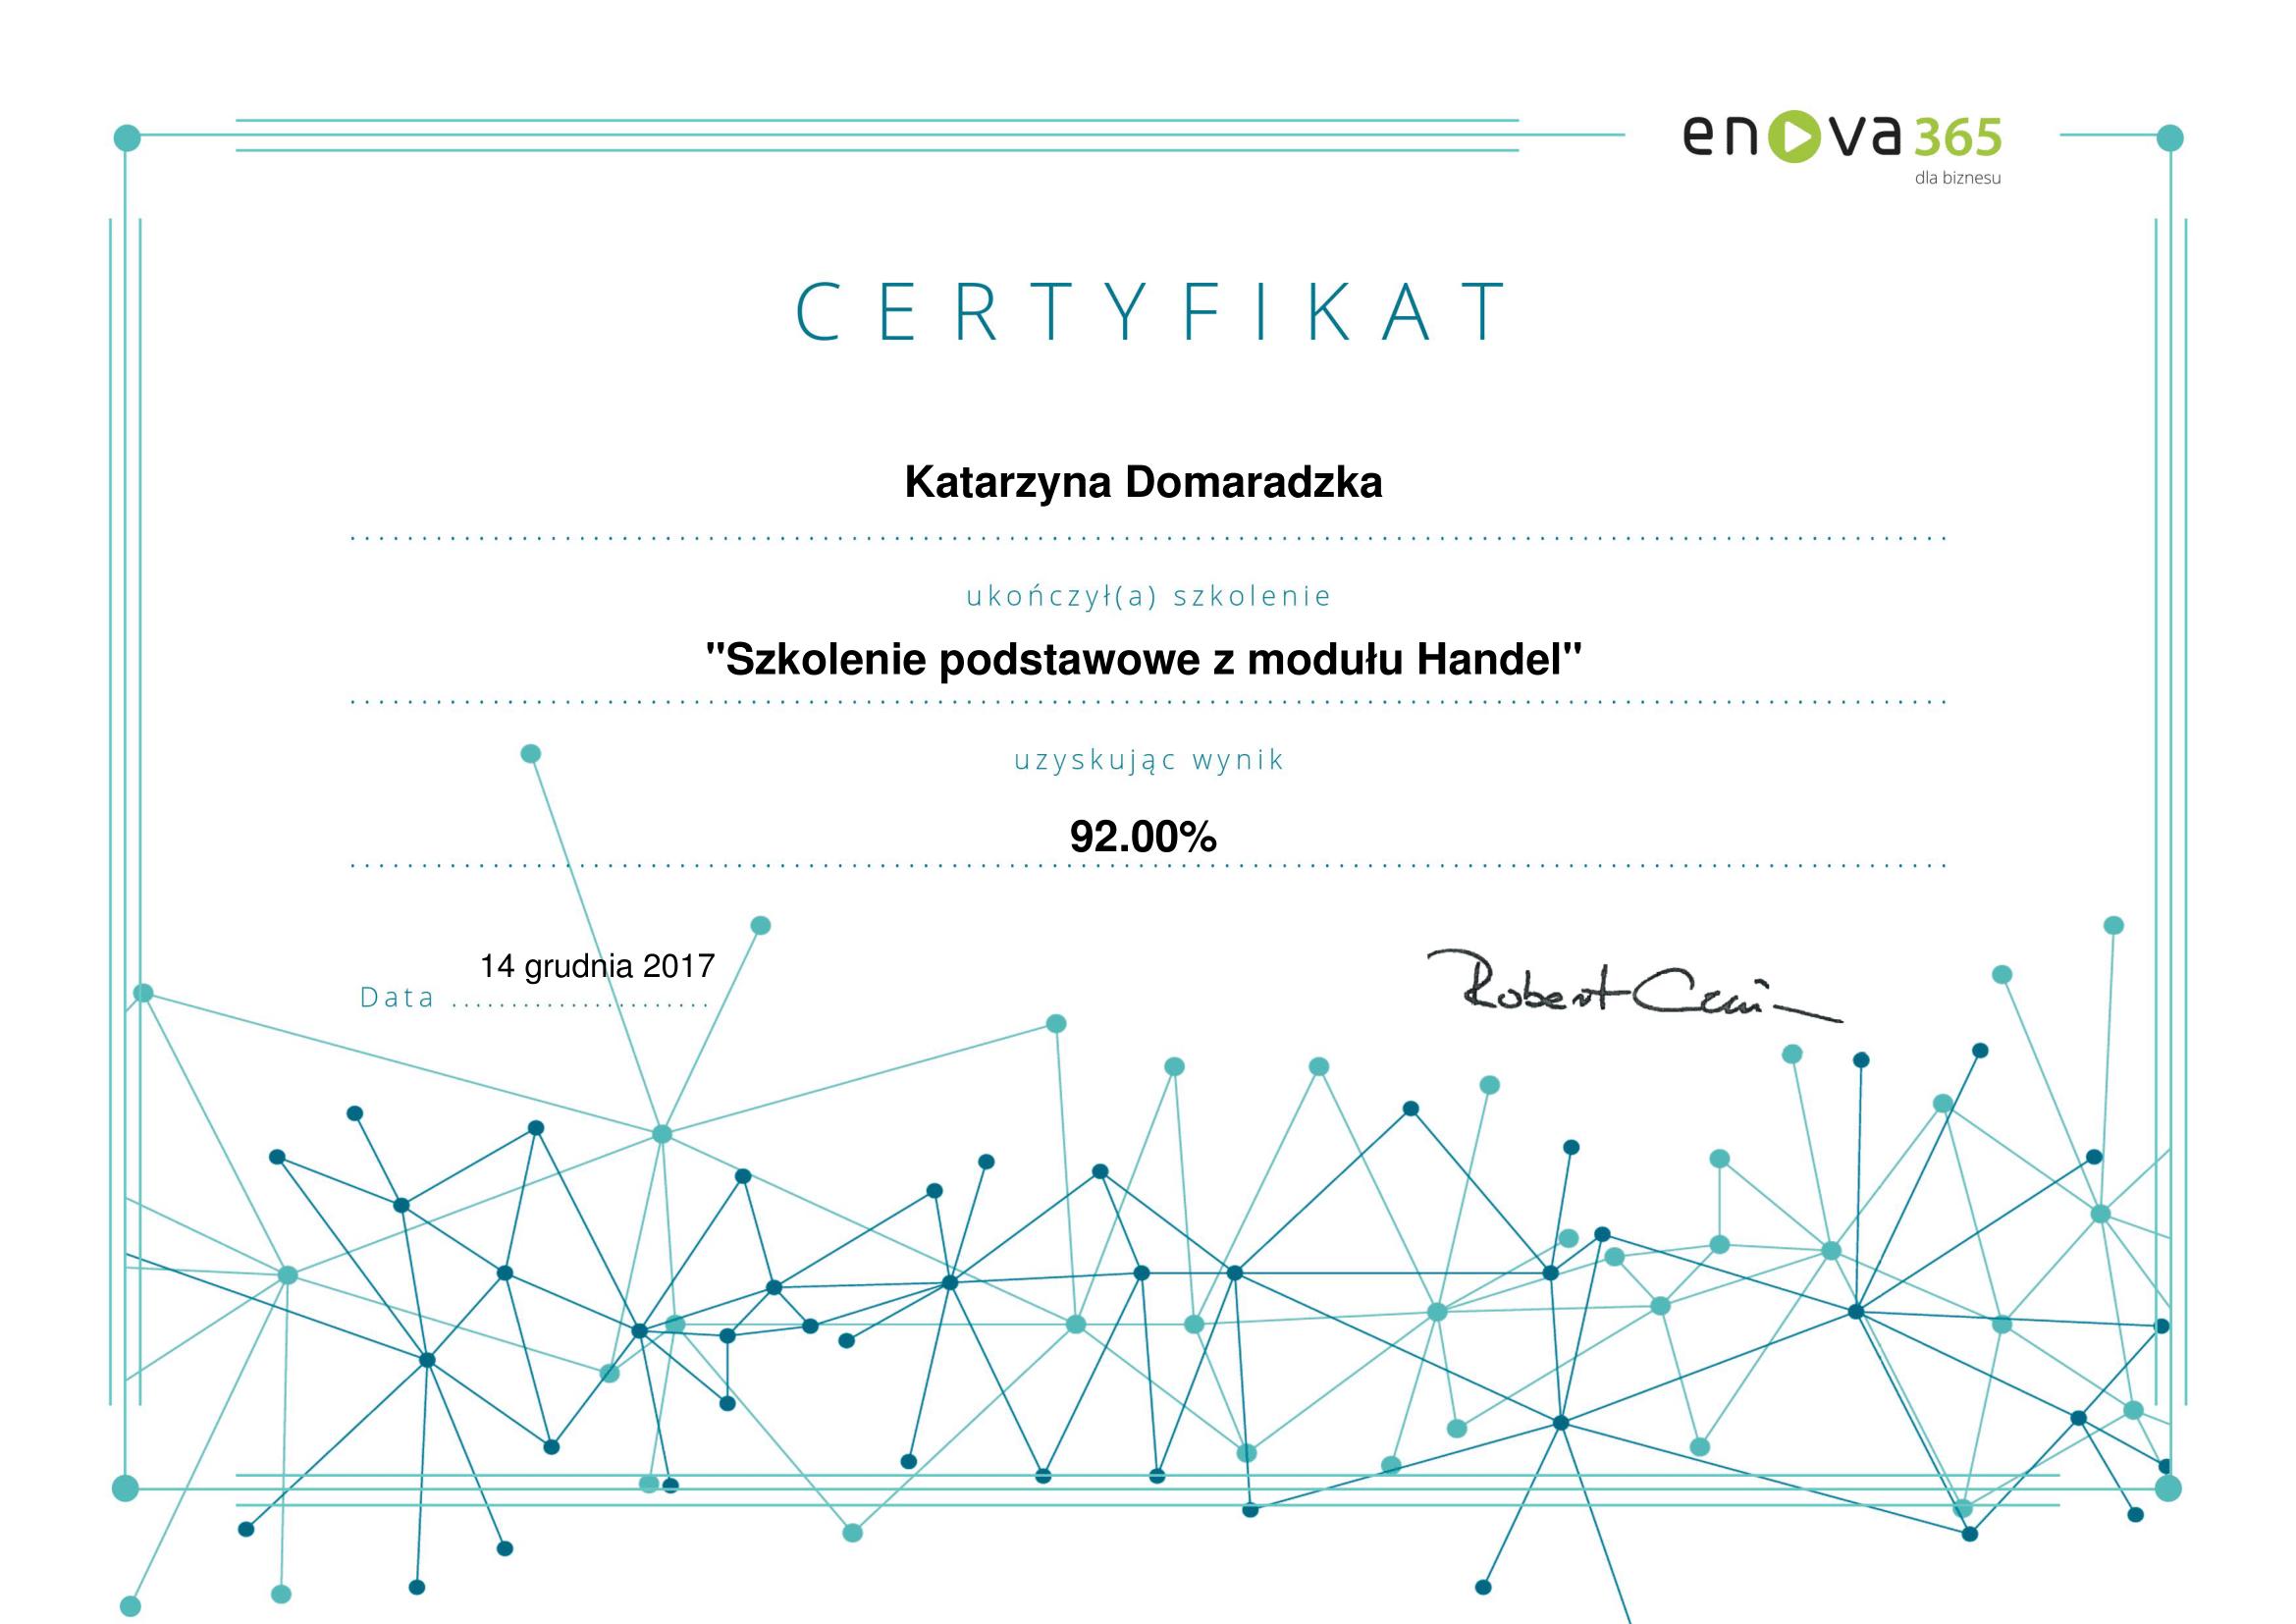 enova365_Certyfikat_podstawowy_Handel